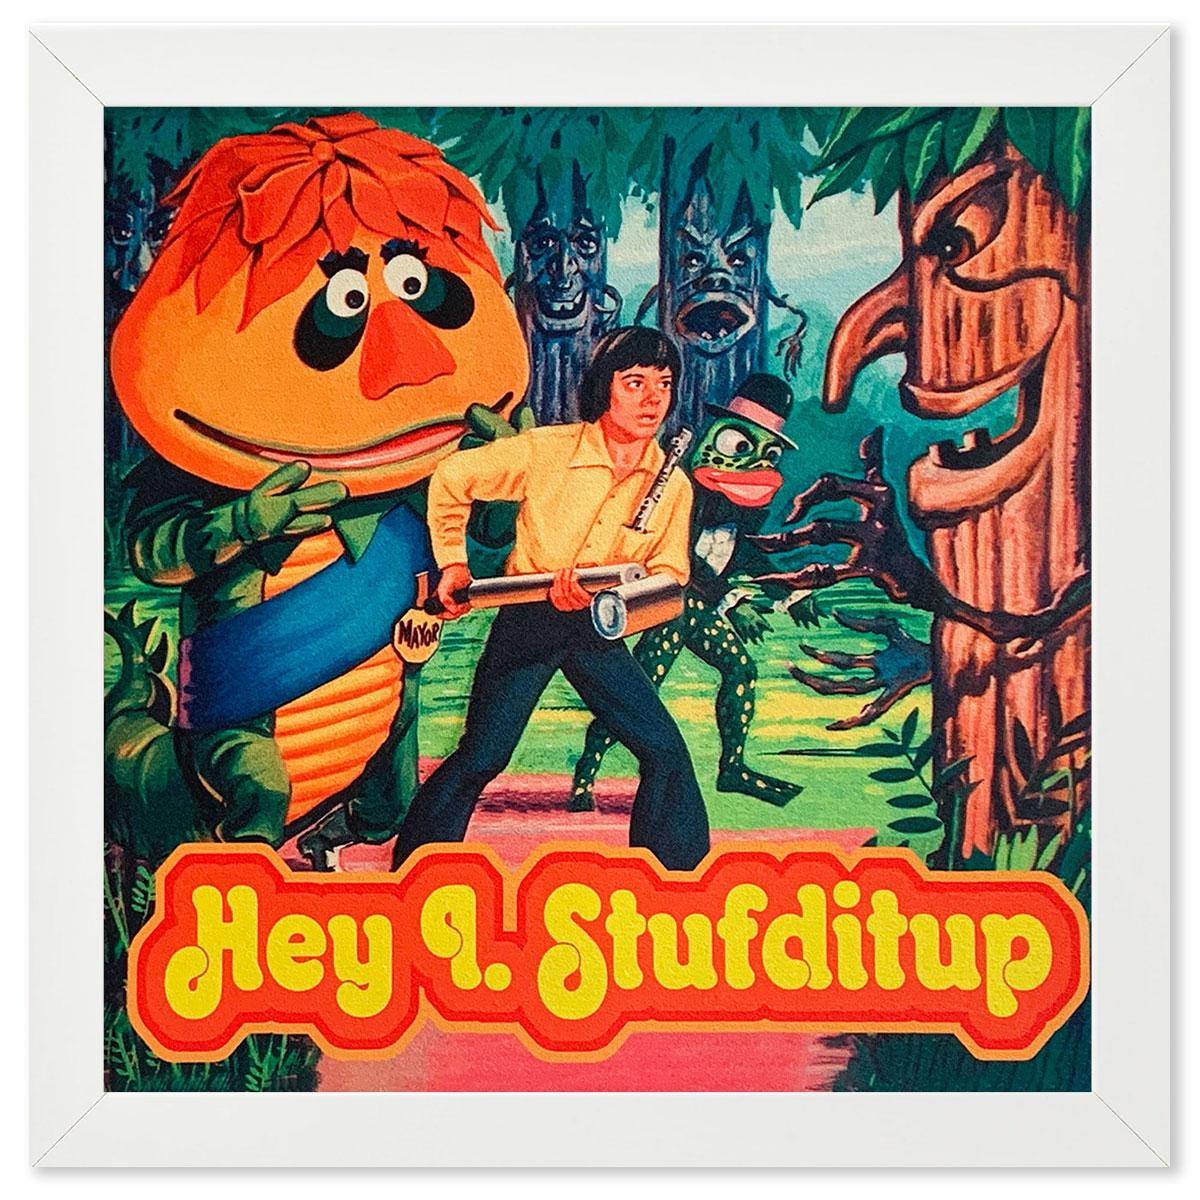 Hey I Stufditup - David Art Wales